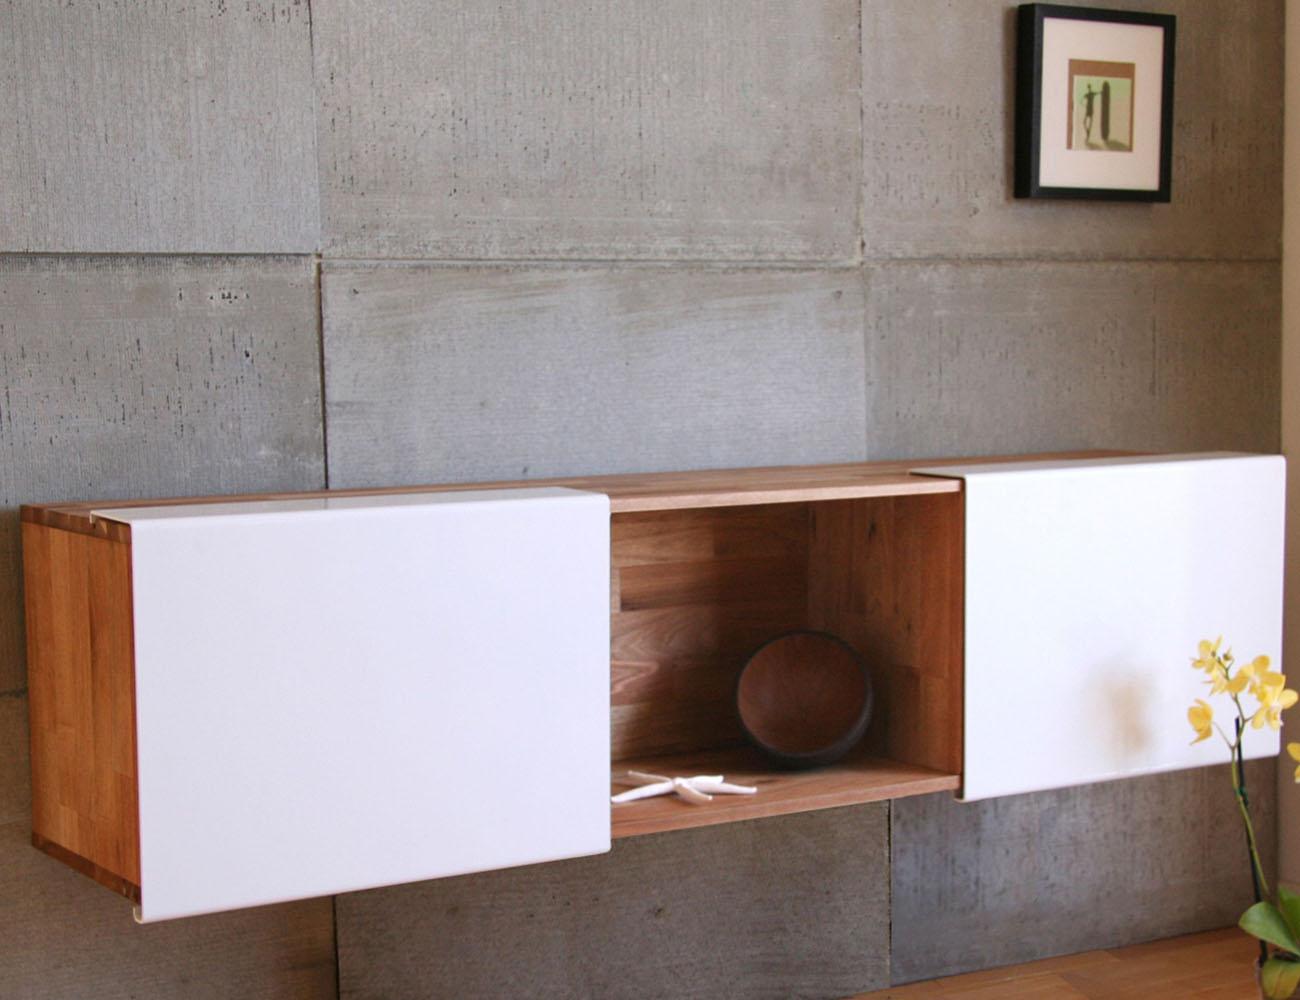 Lax series floating wall shelf by mash studios gadget flow for Mash studios lax